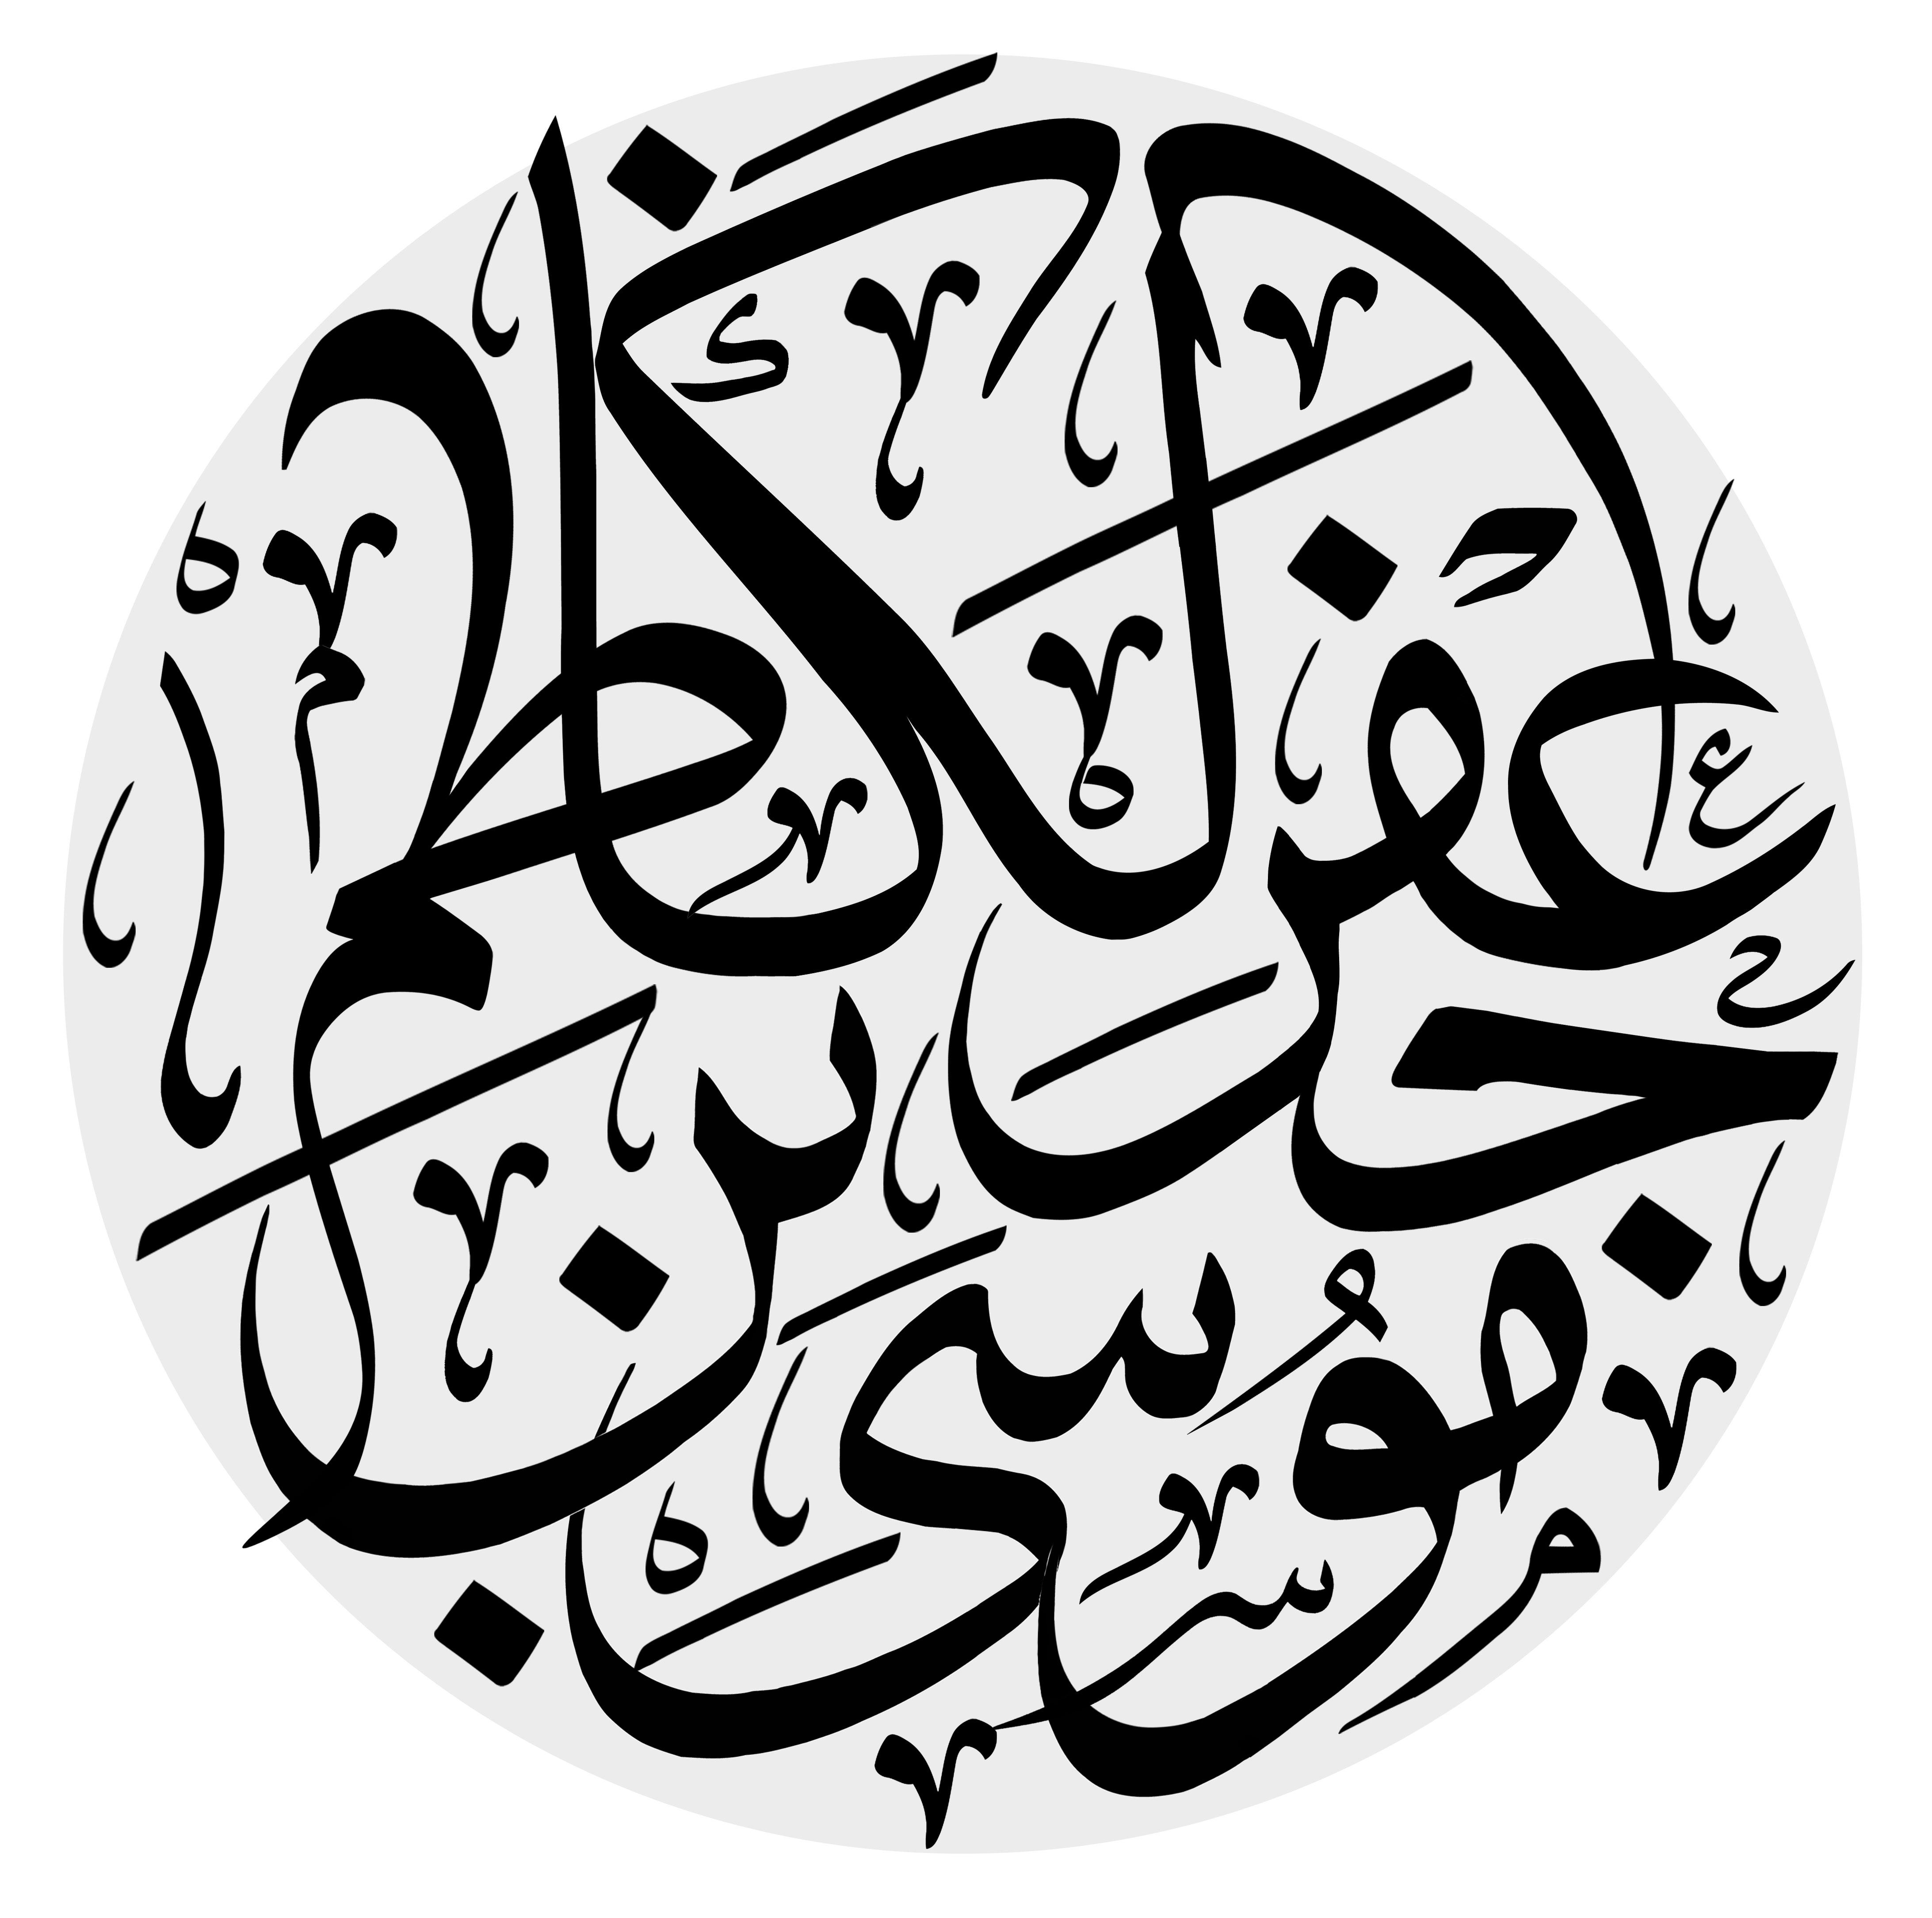 (امام هفتم)امام موسي بن جعفر(ع)